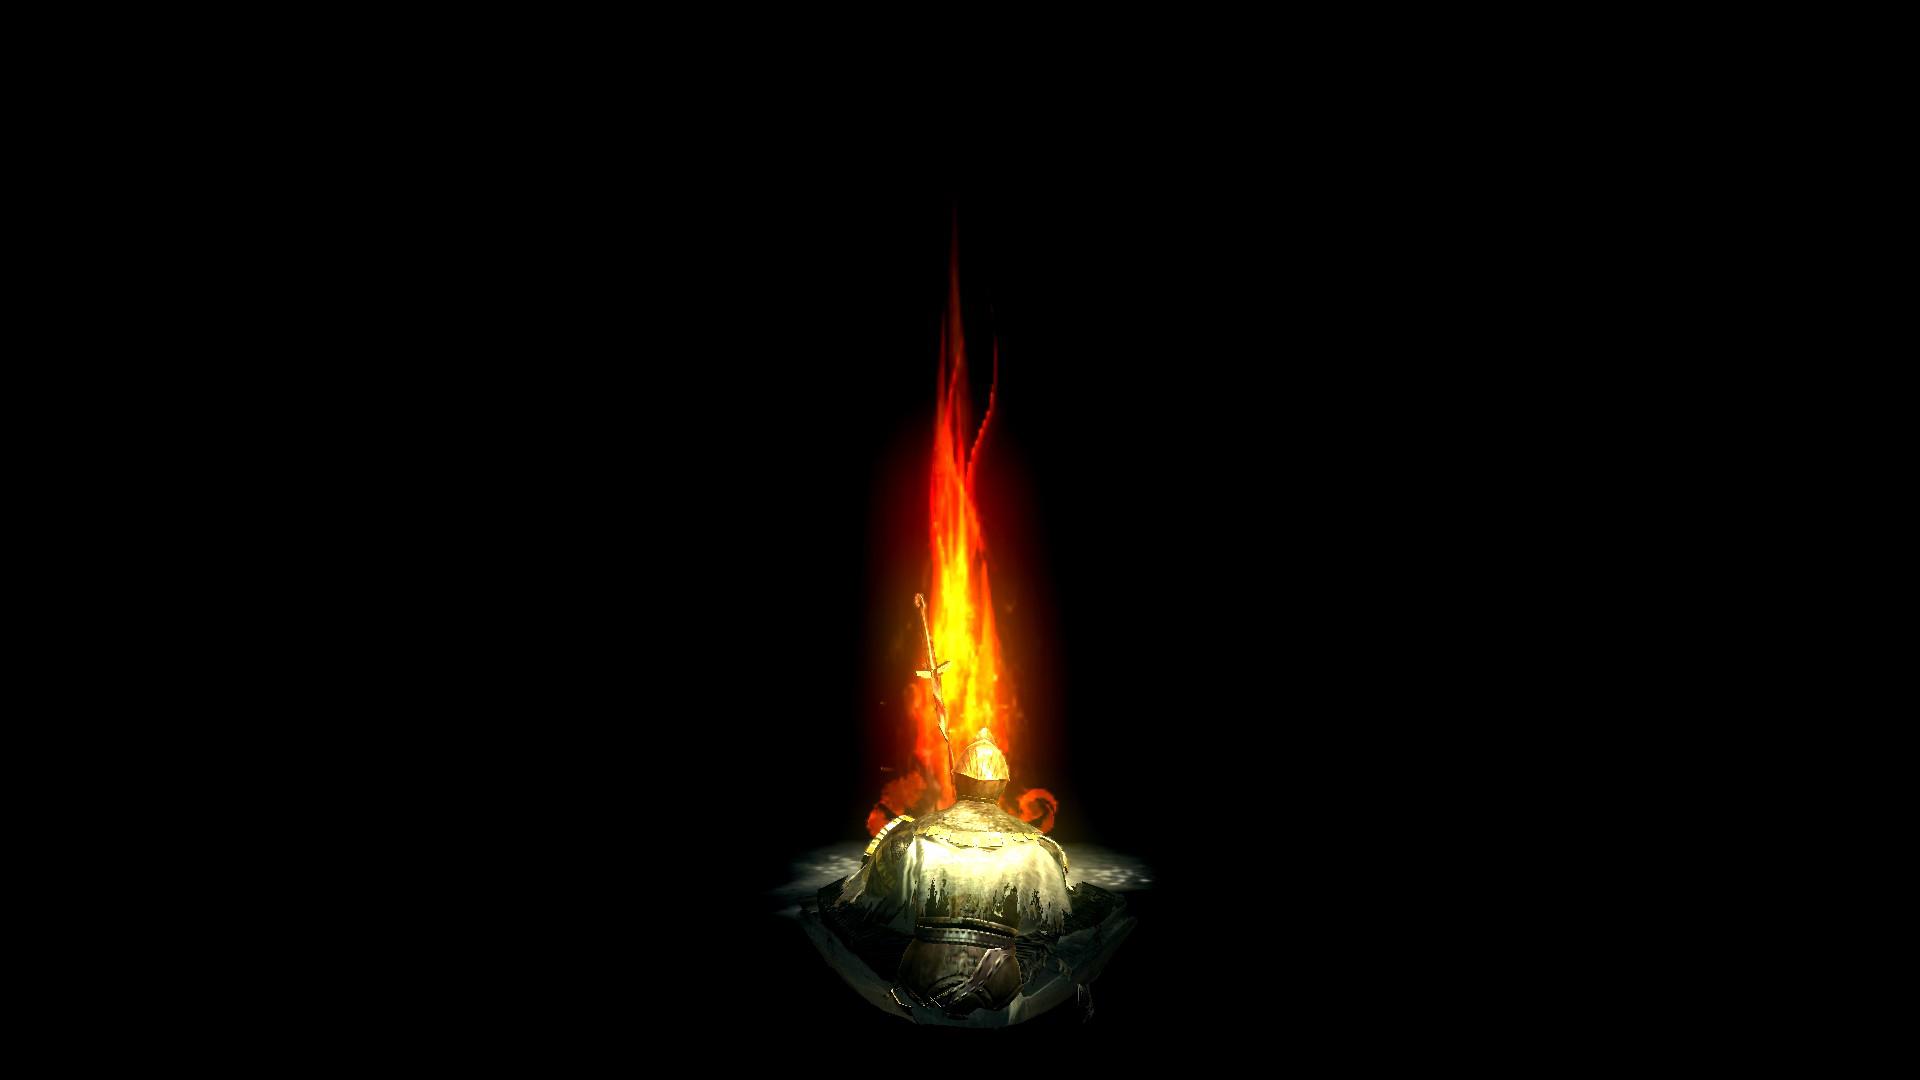 Dark Souls Background 1920x1080: Dark Souls Bonfire Wallpaper